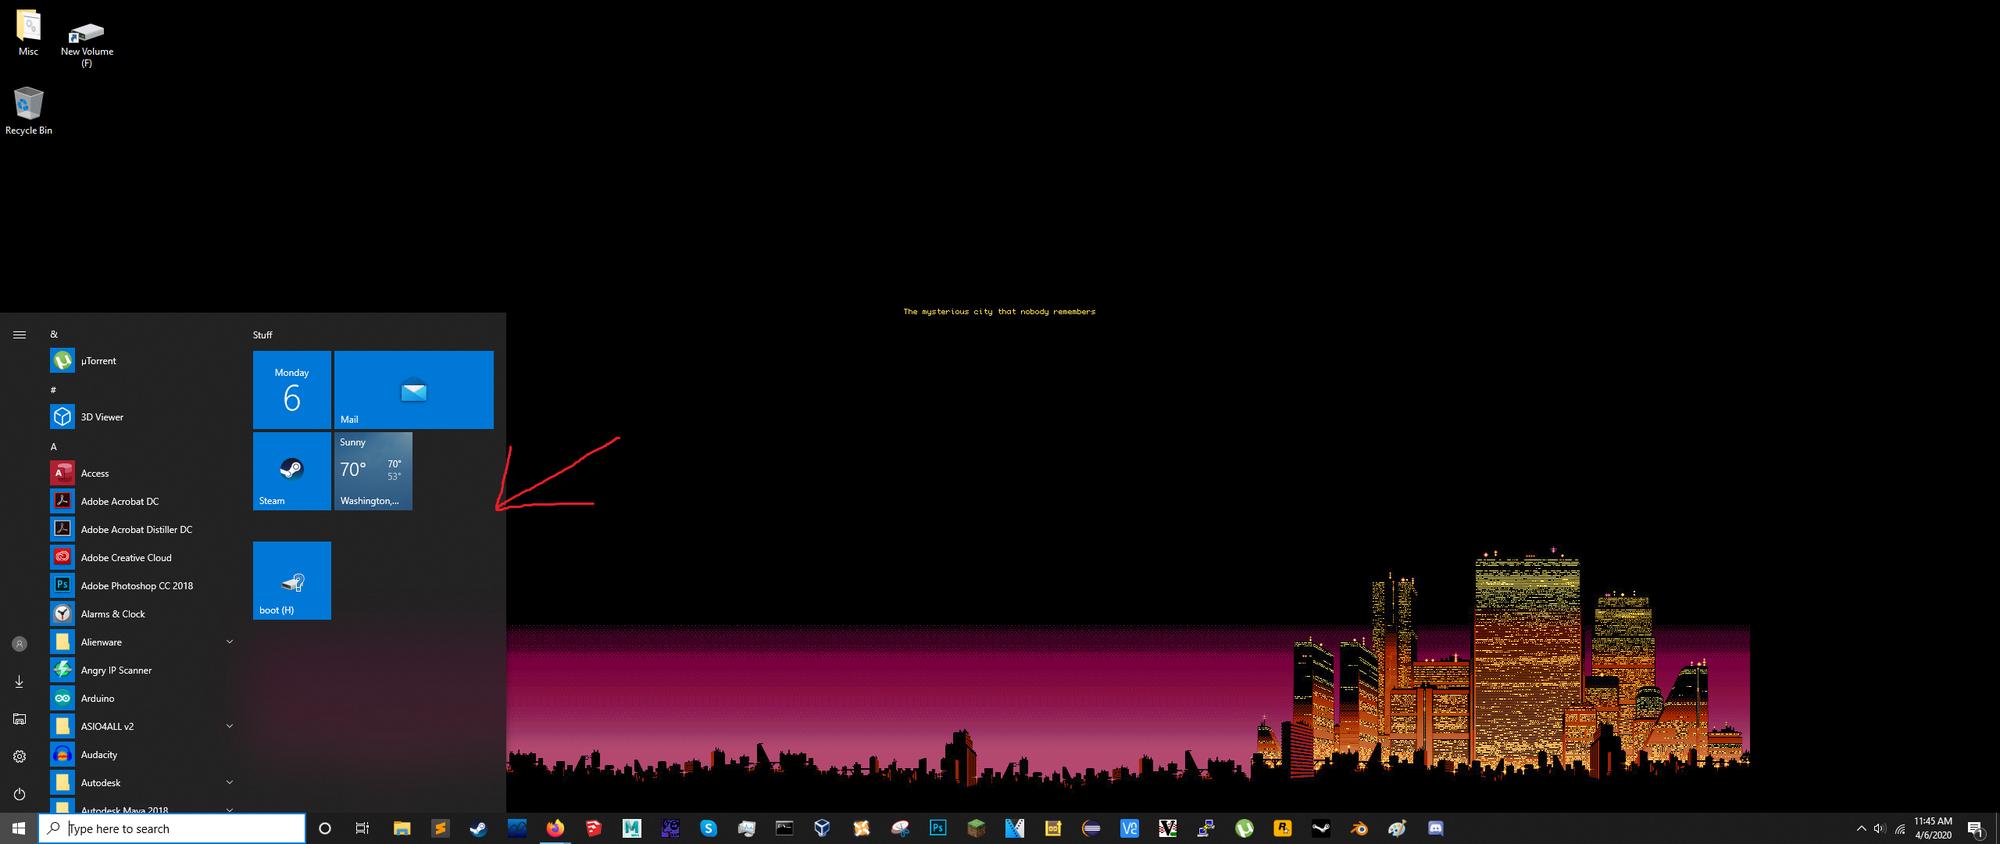 Grey Horizontal Lines on Screen d8ece034-d070-41b3-9c41-75f349bf67aa?upload=true.png